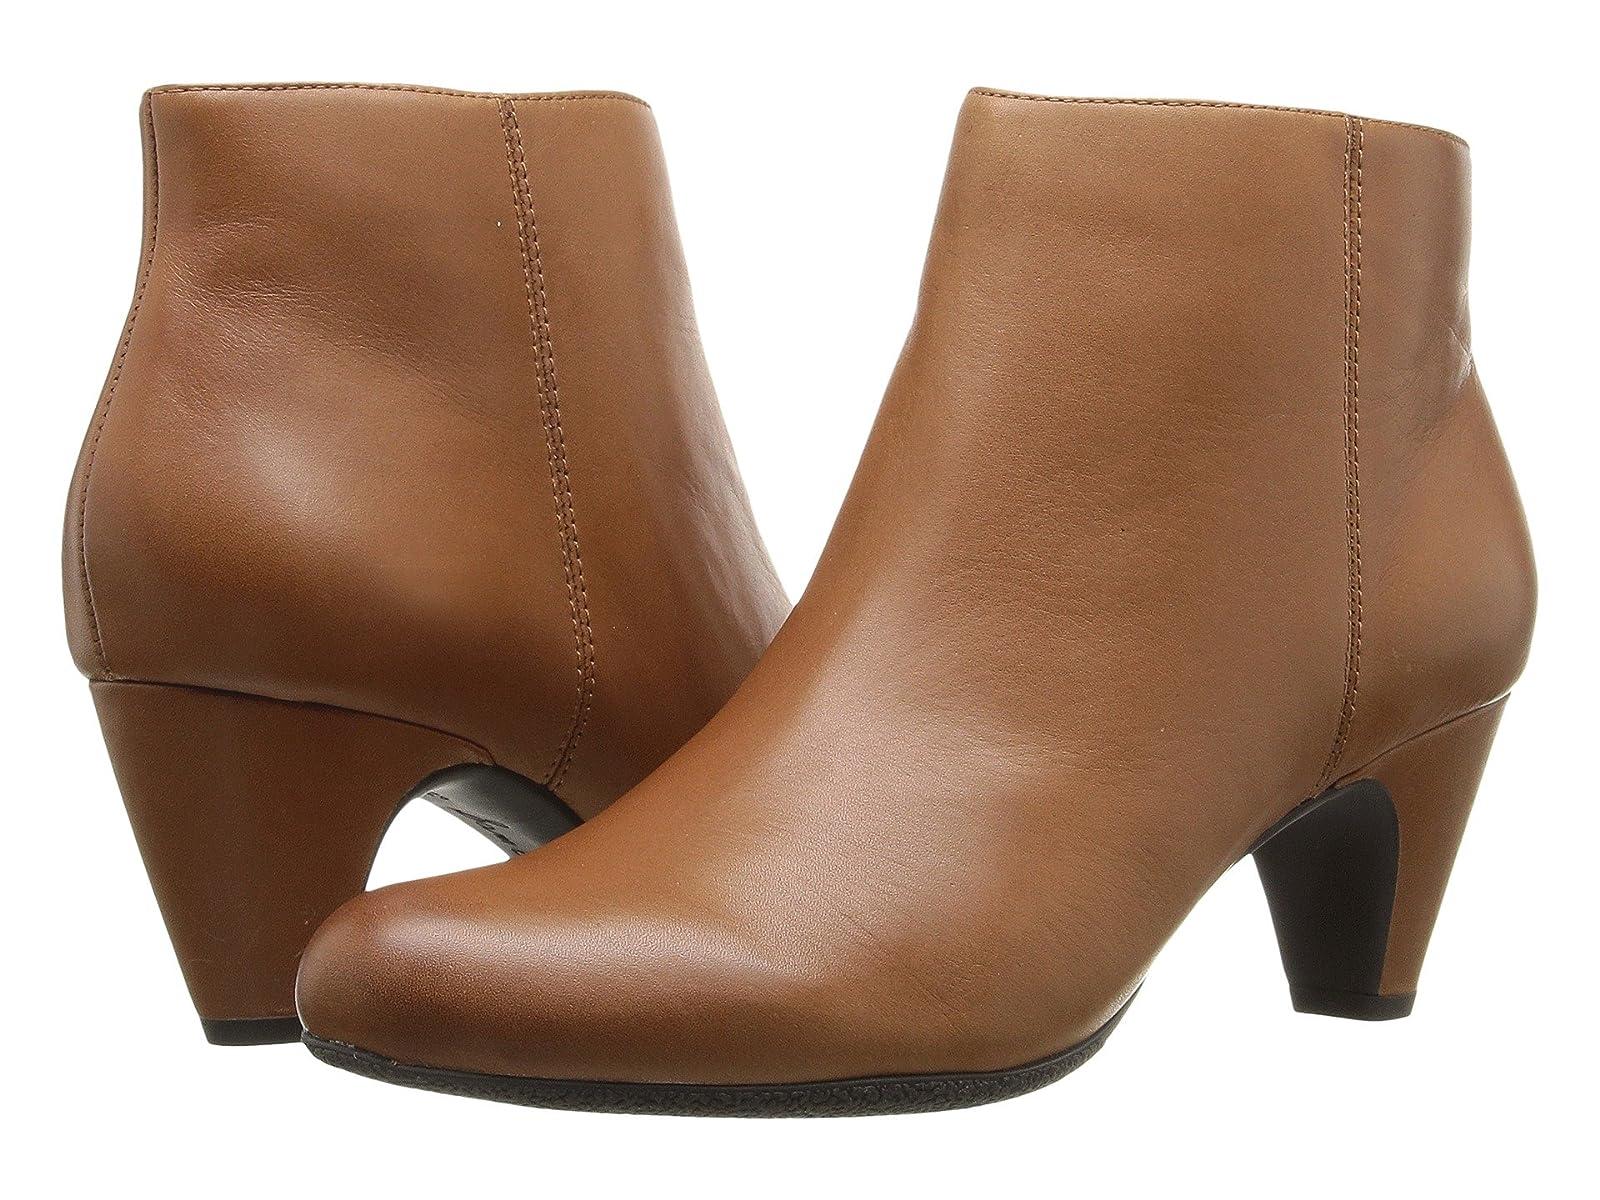 Sam Edelman MichelleCheap and distinctive eye-catching shoes